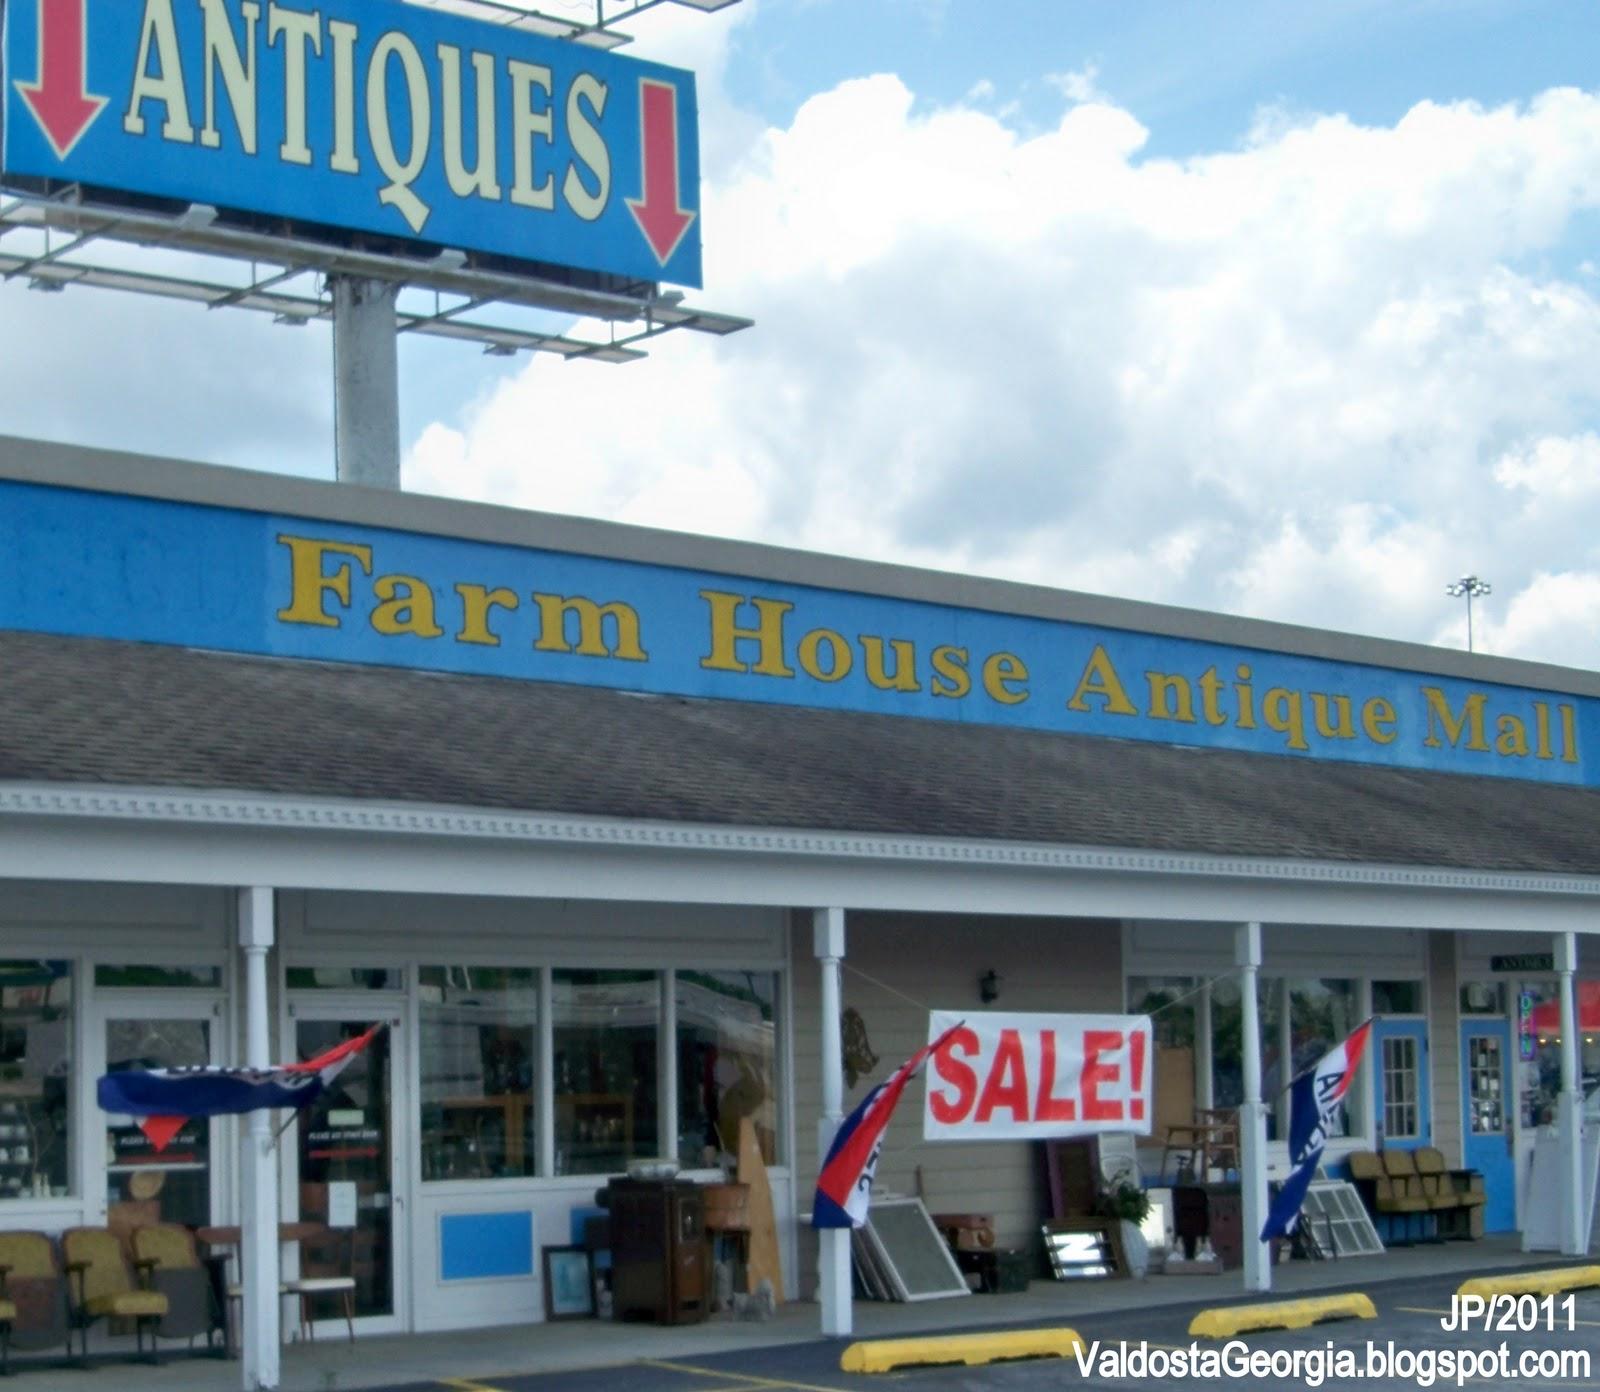 Antiques Farm House Antique Mall Valdosta Georgia Lakes Boulevard Lake Park I 75 Exit Collectables Lowndes County Ga